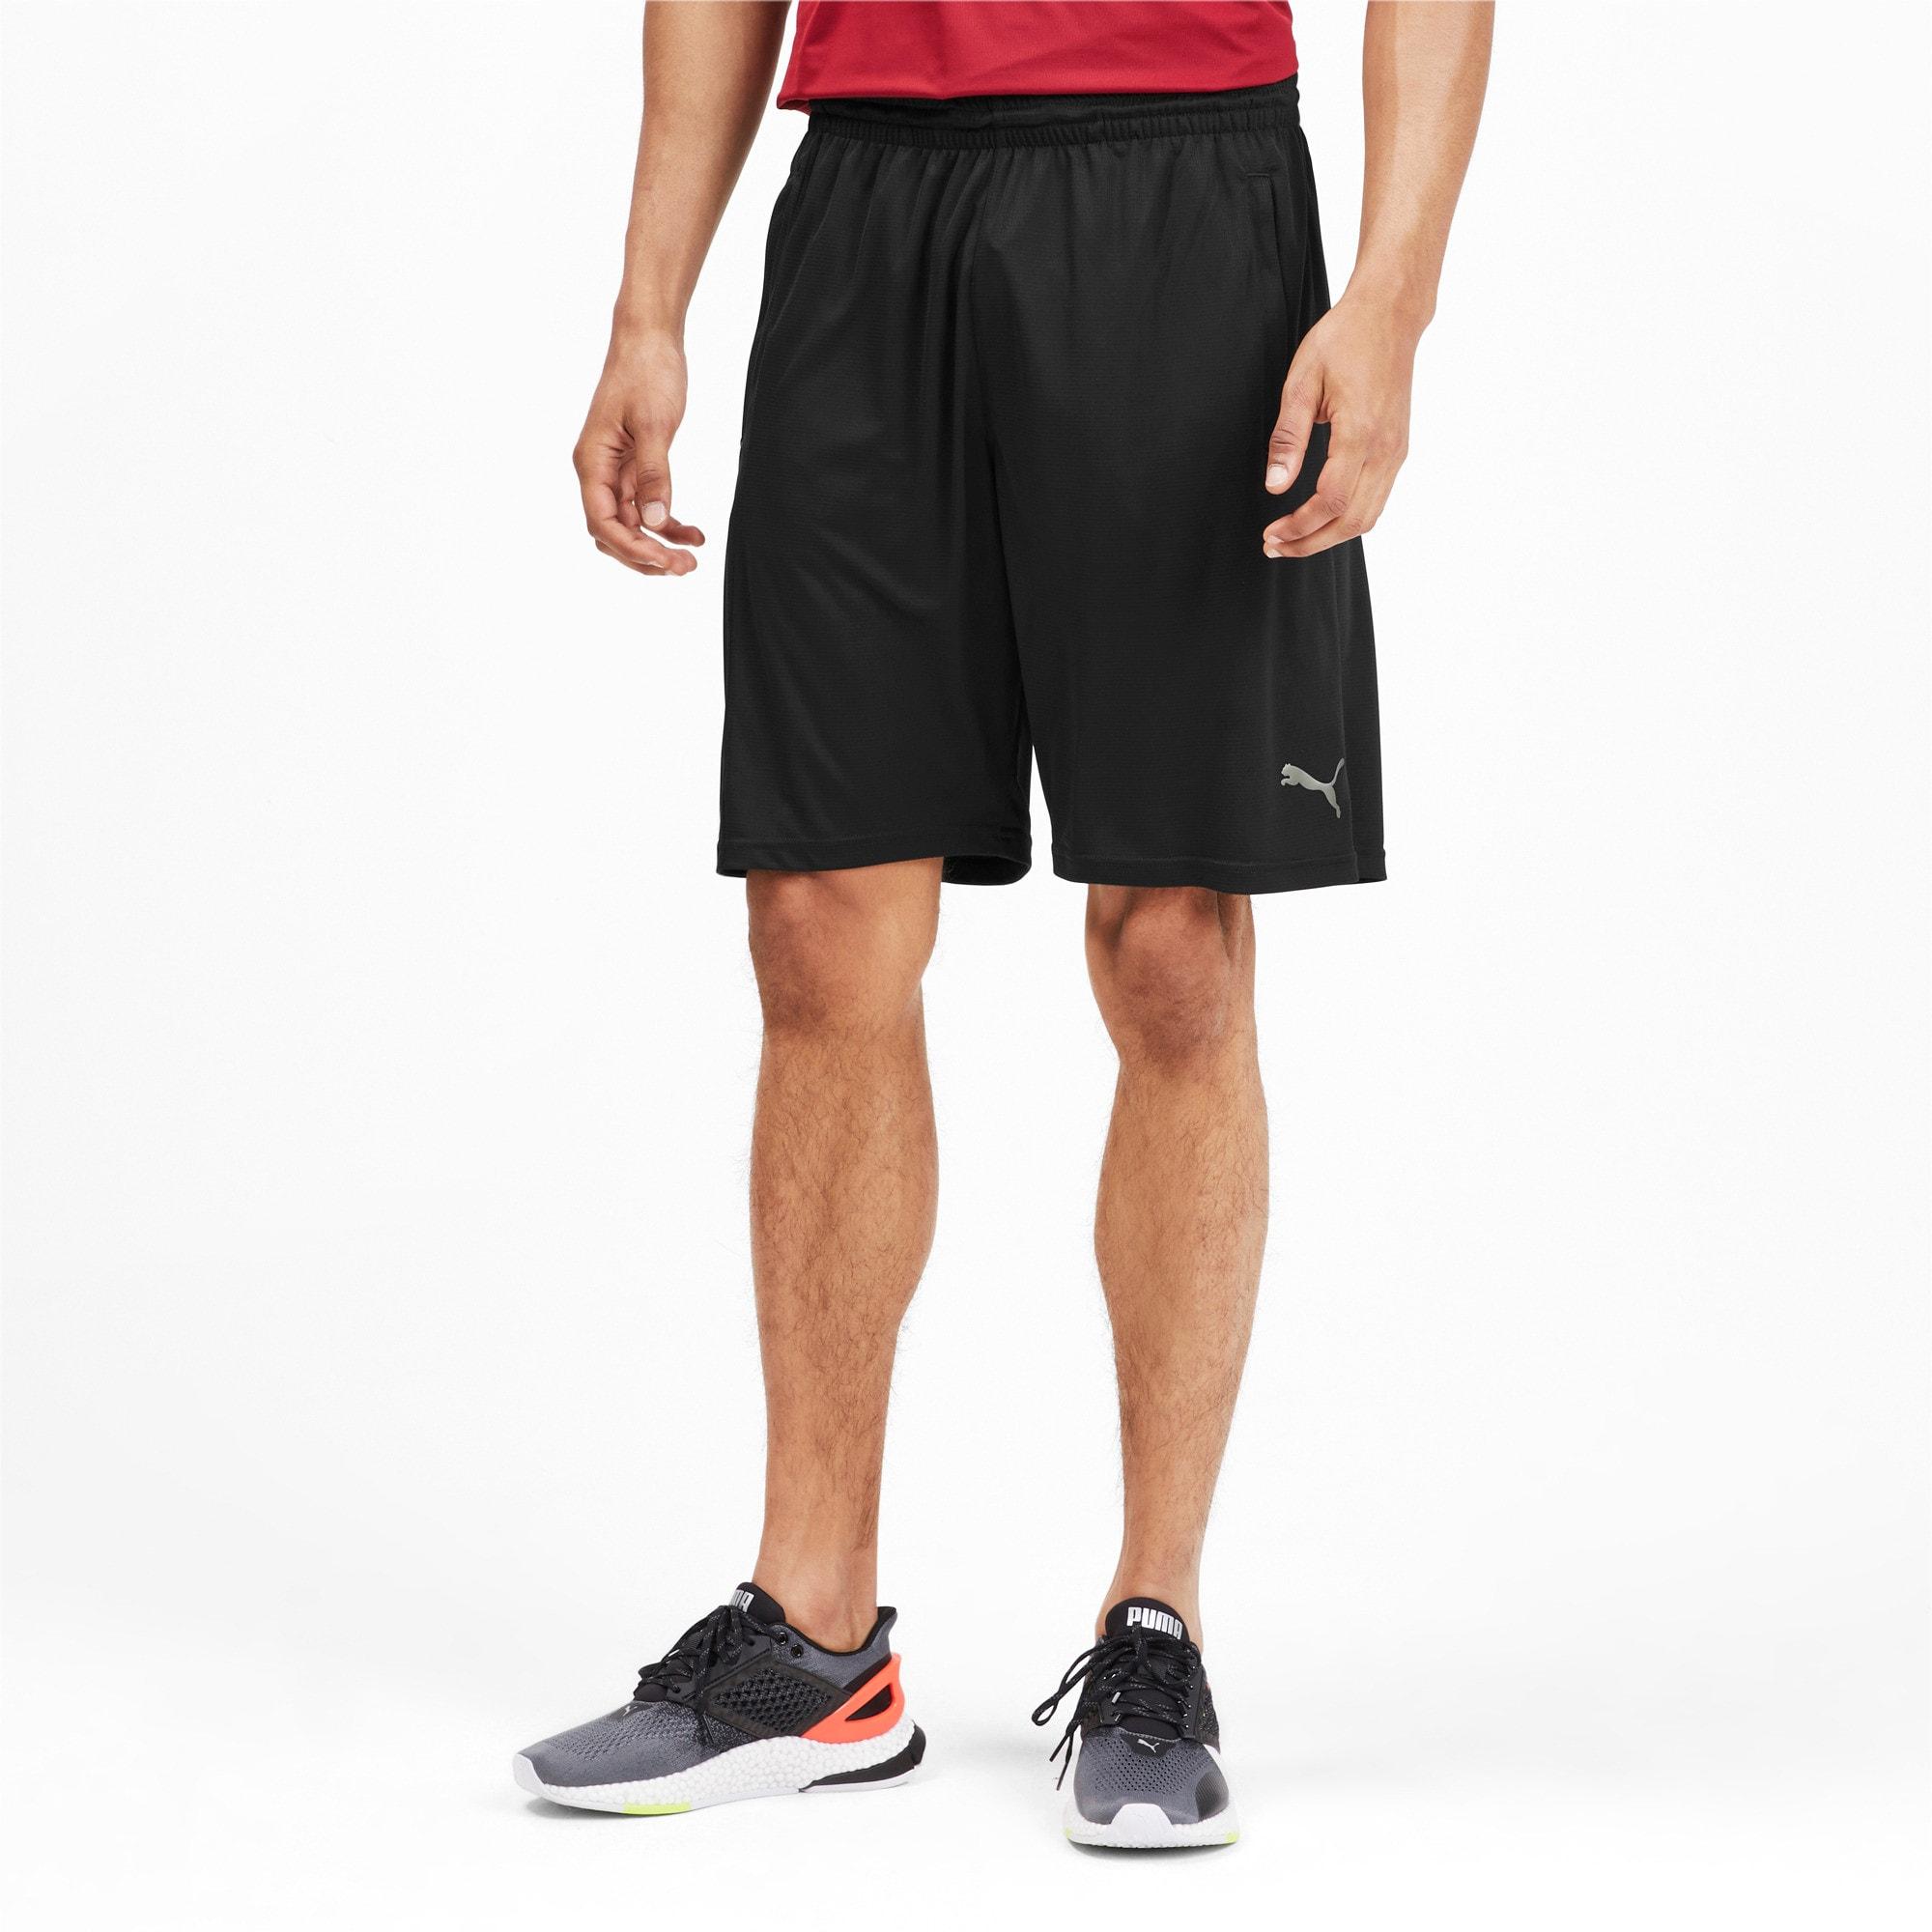 Miniatura 1 de Shorts de punto Collective para hombre, Puma Black-Nrgy Red, mediano